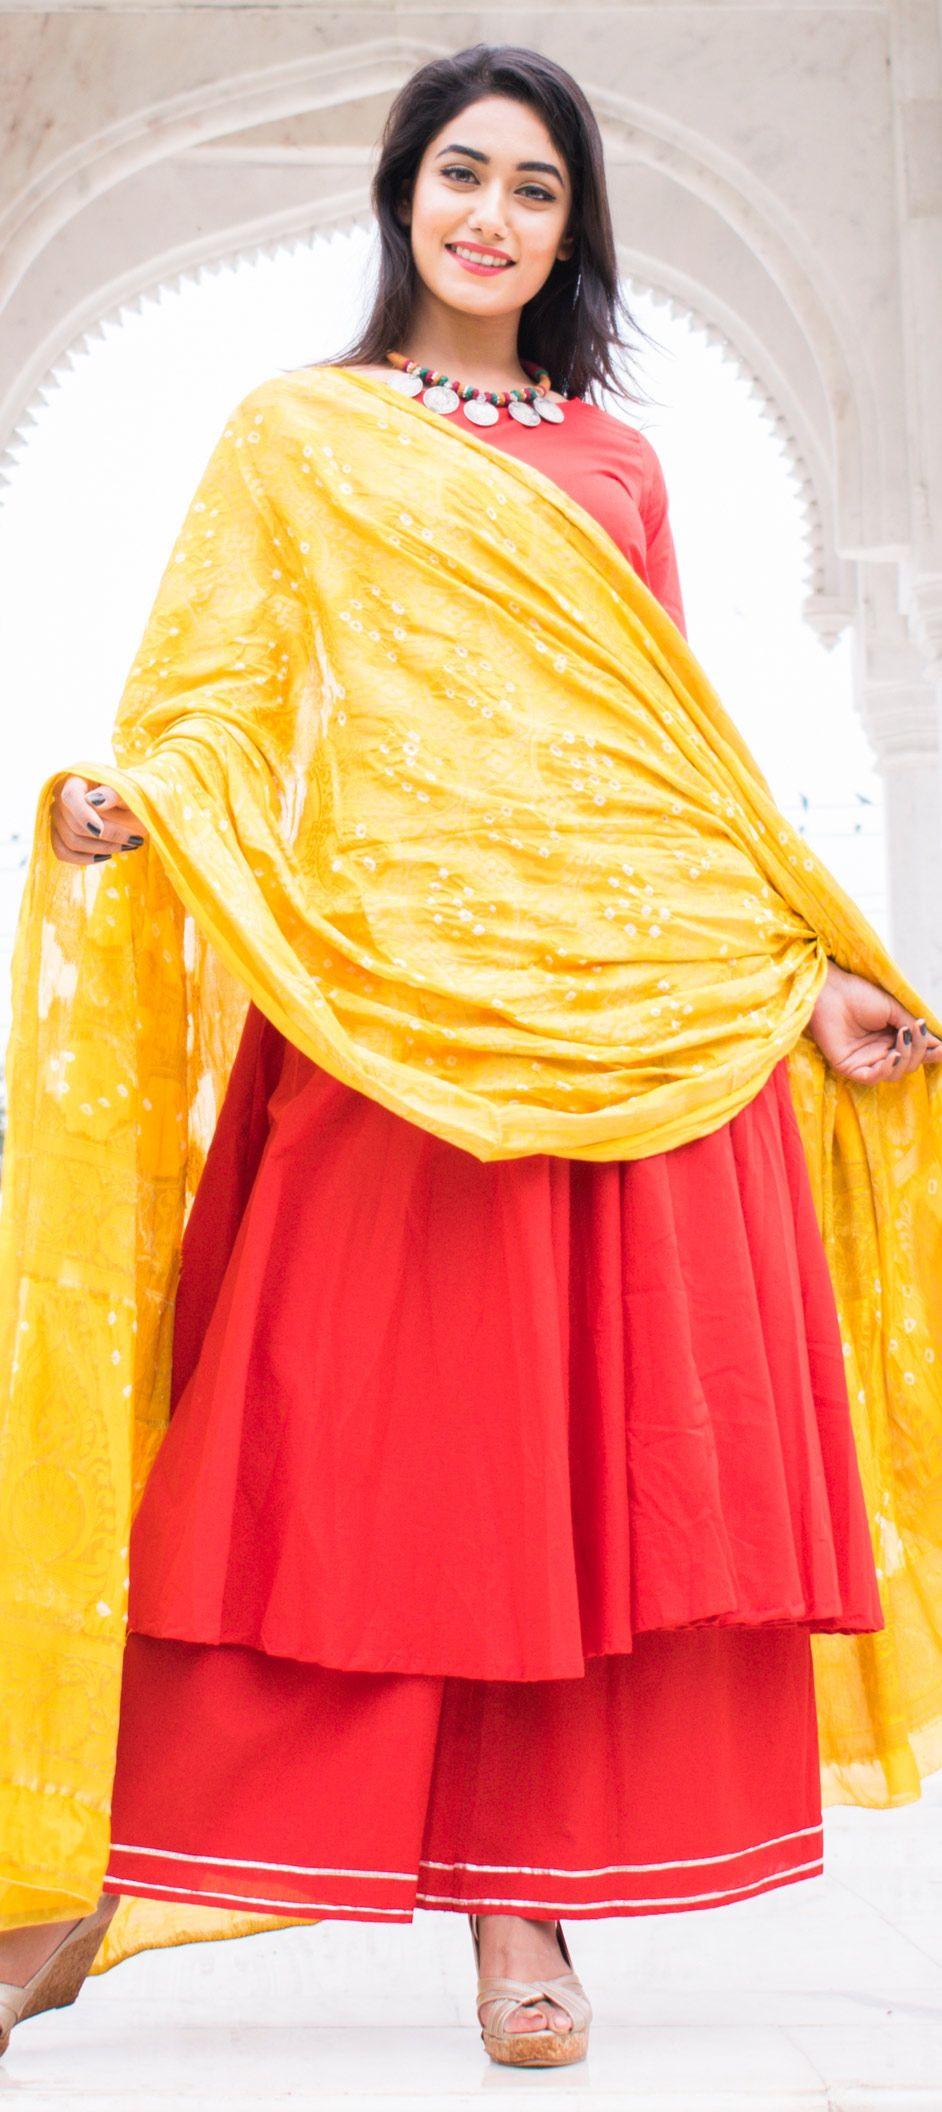 45a360f457 1532124: Designer Red and Maroon color Cotton fabric Salwar Kameez